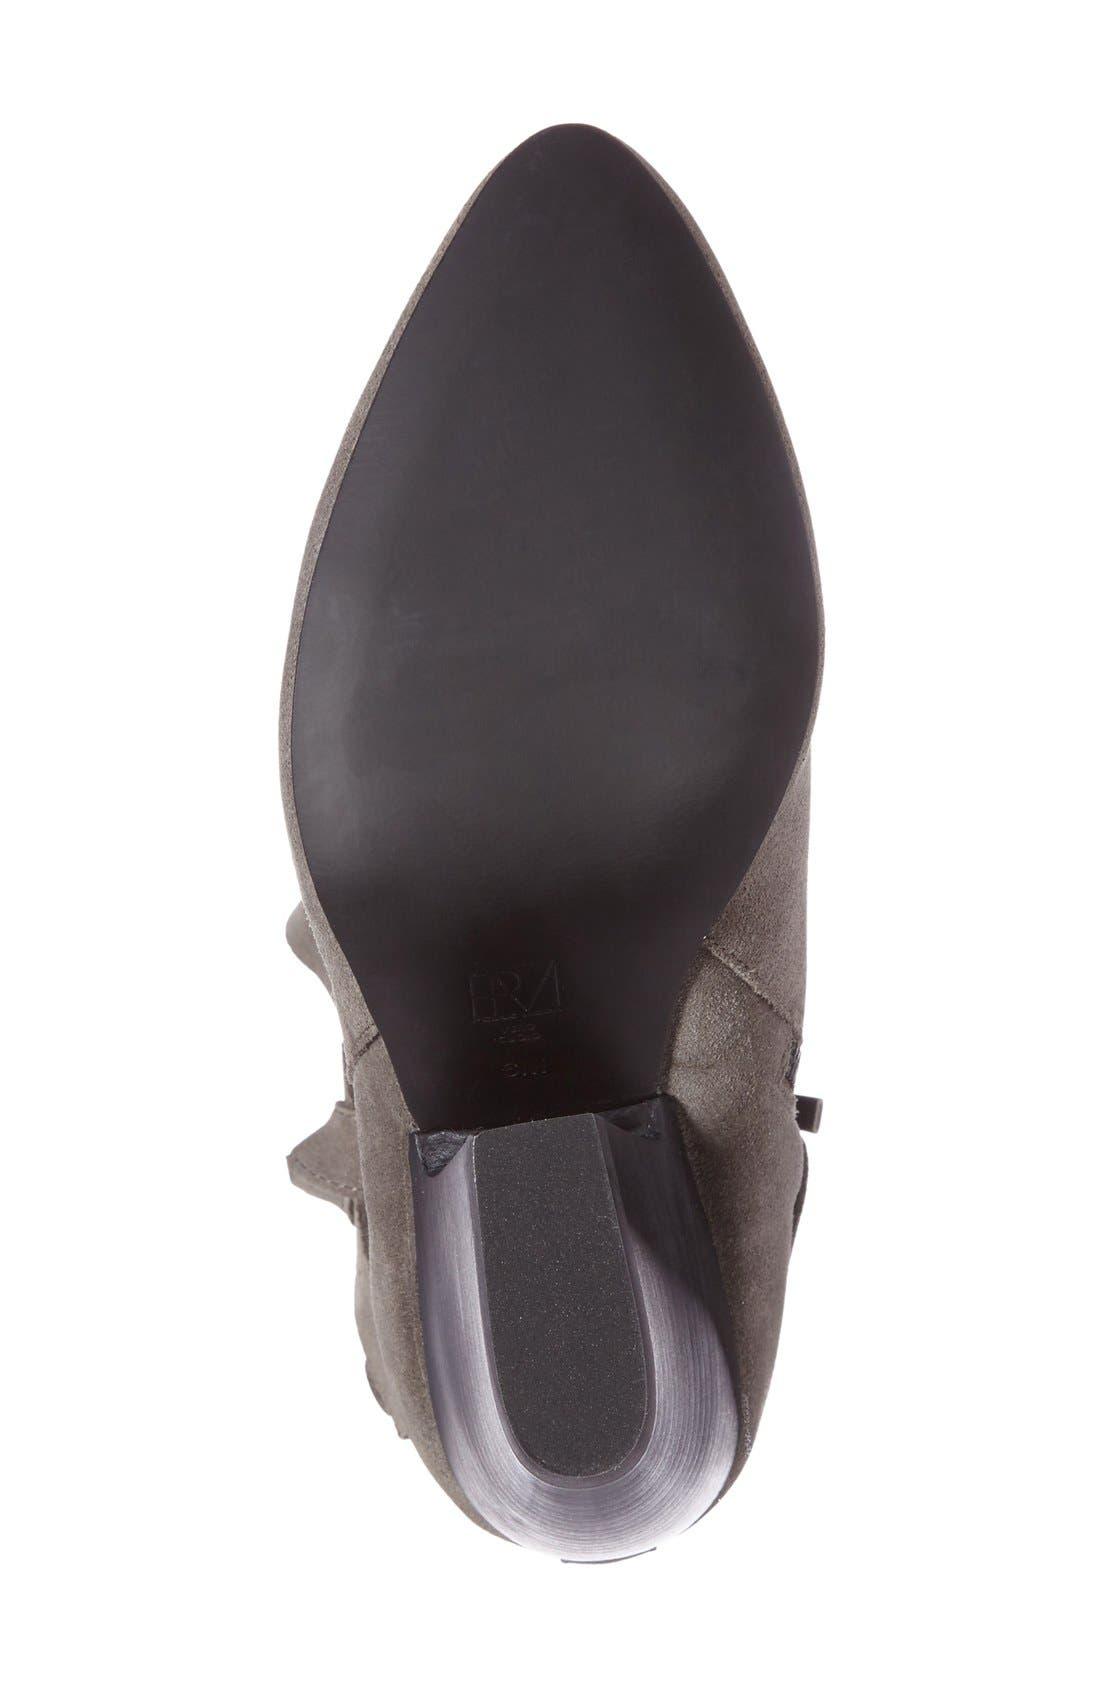 Jax Block Heel Bootie,                             Alternate thumbnail 4, color,                             Mouse Grey Leather